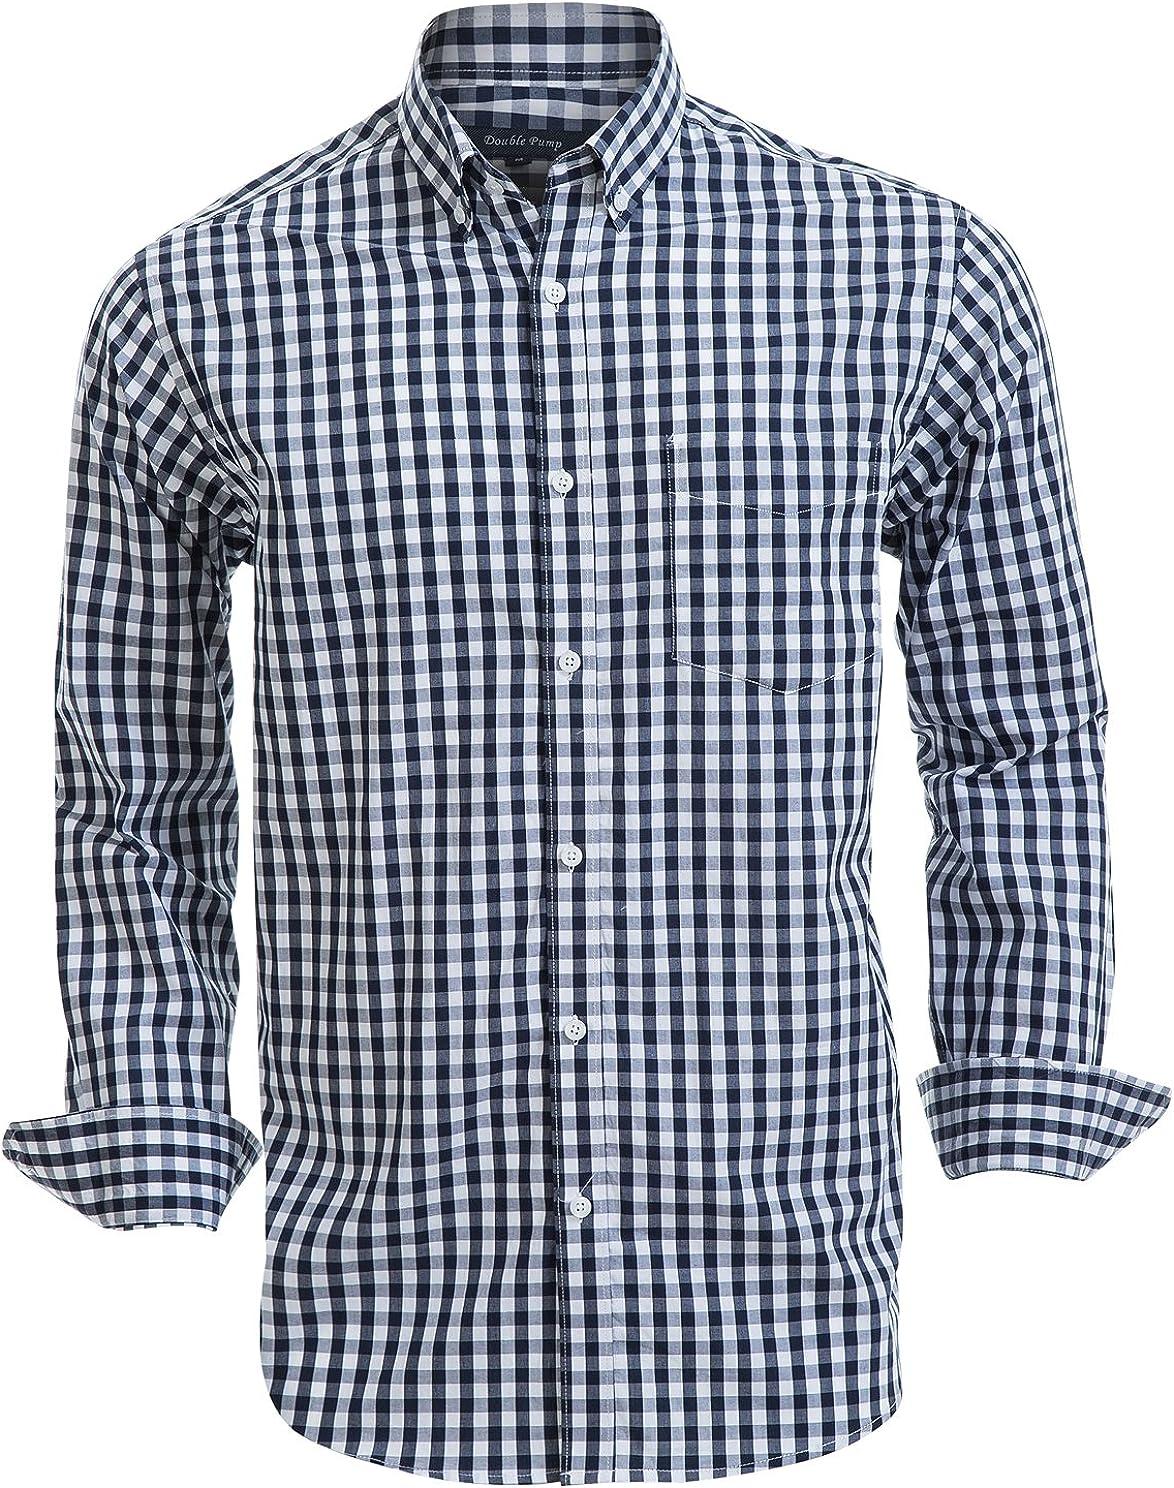 YYear Mens Regular Fit Stitching Casual Long Sleeve Plaid Print Button Down Shirt